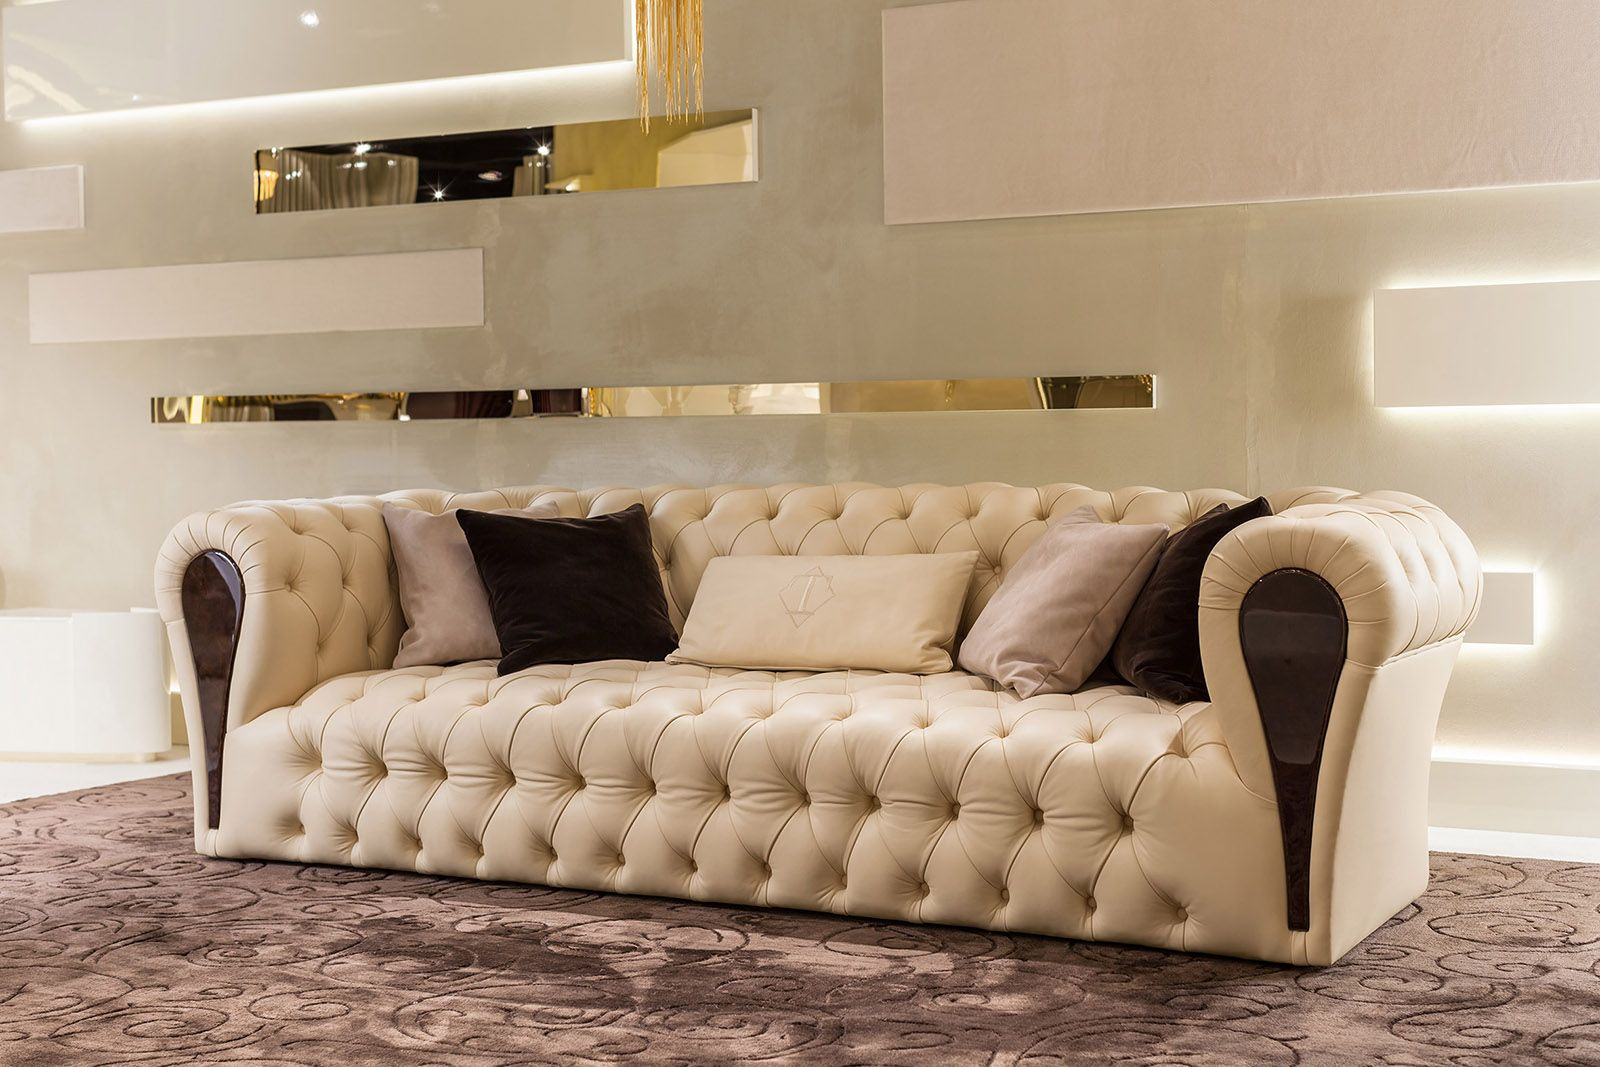 Turri - Luxury Italian Furniture for exclusive and modern ...